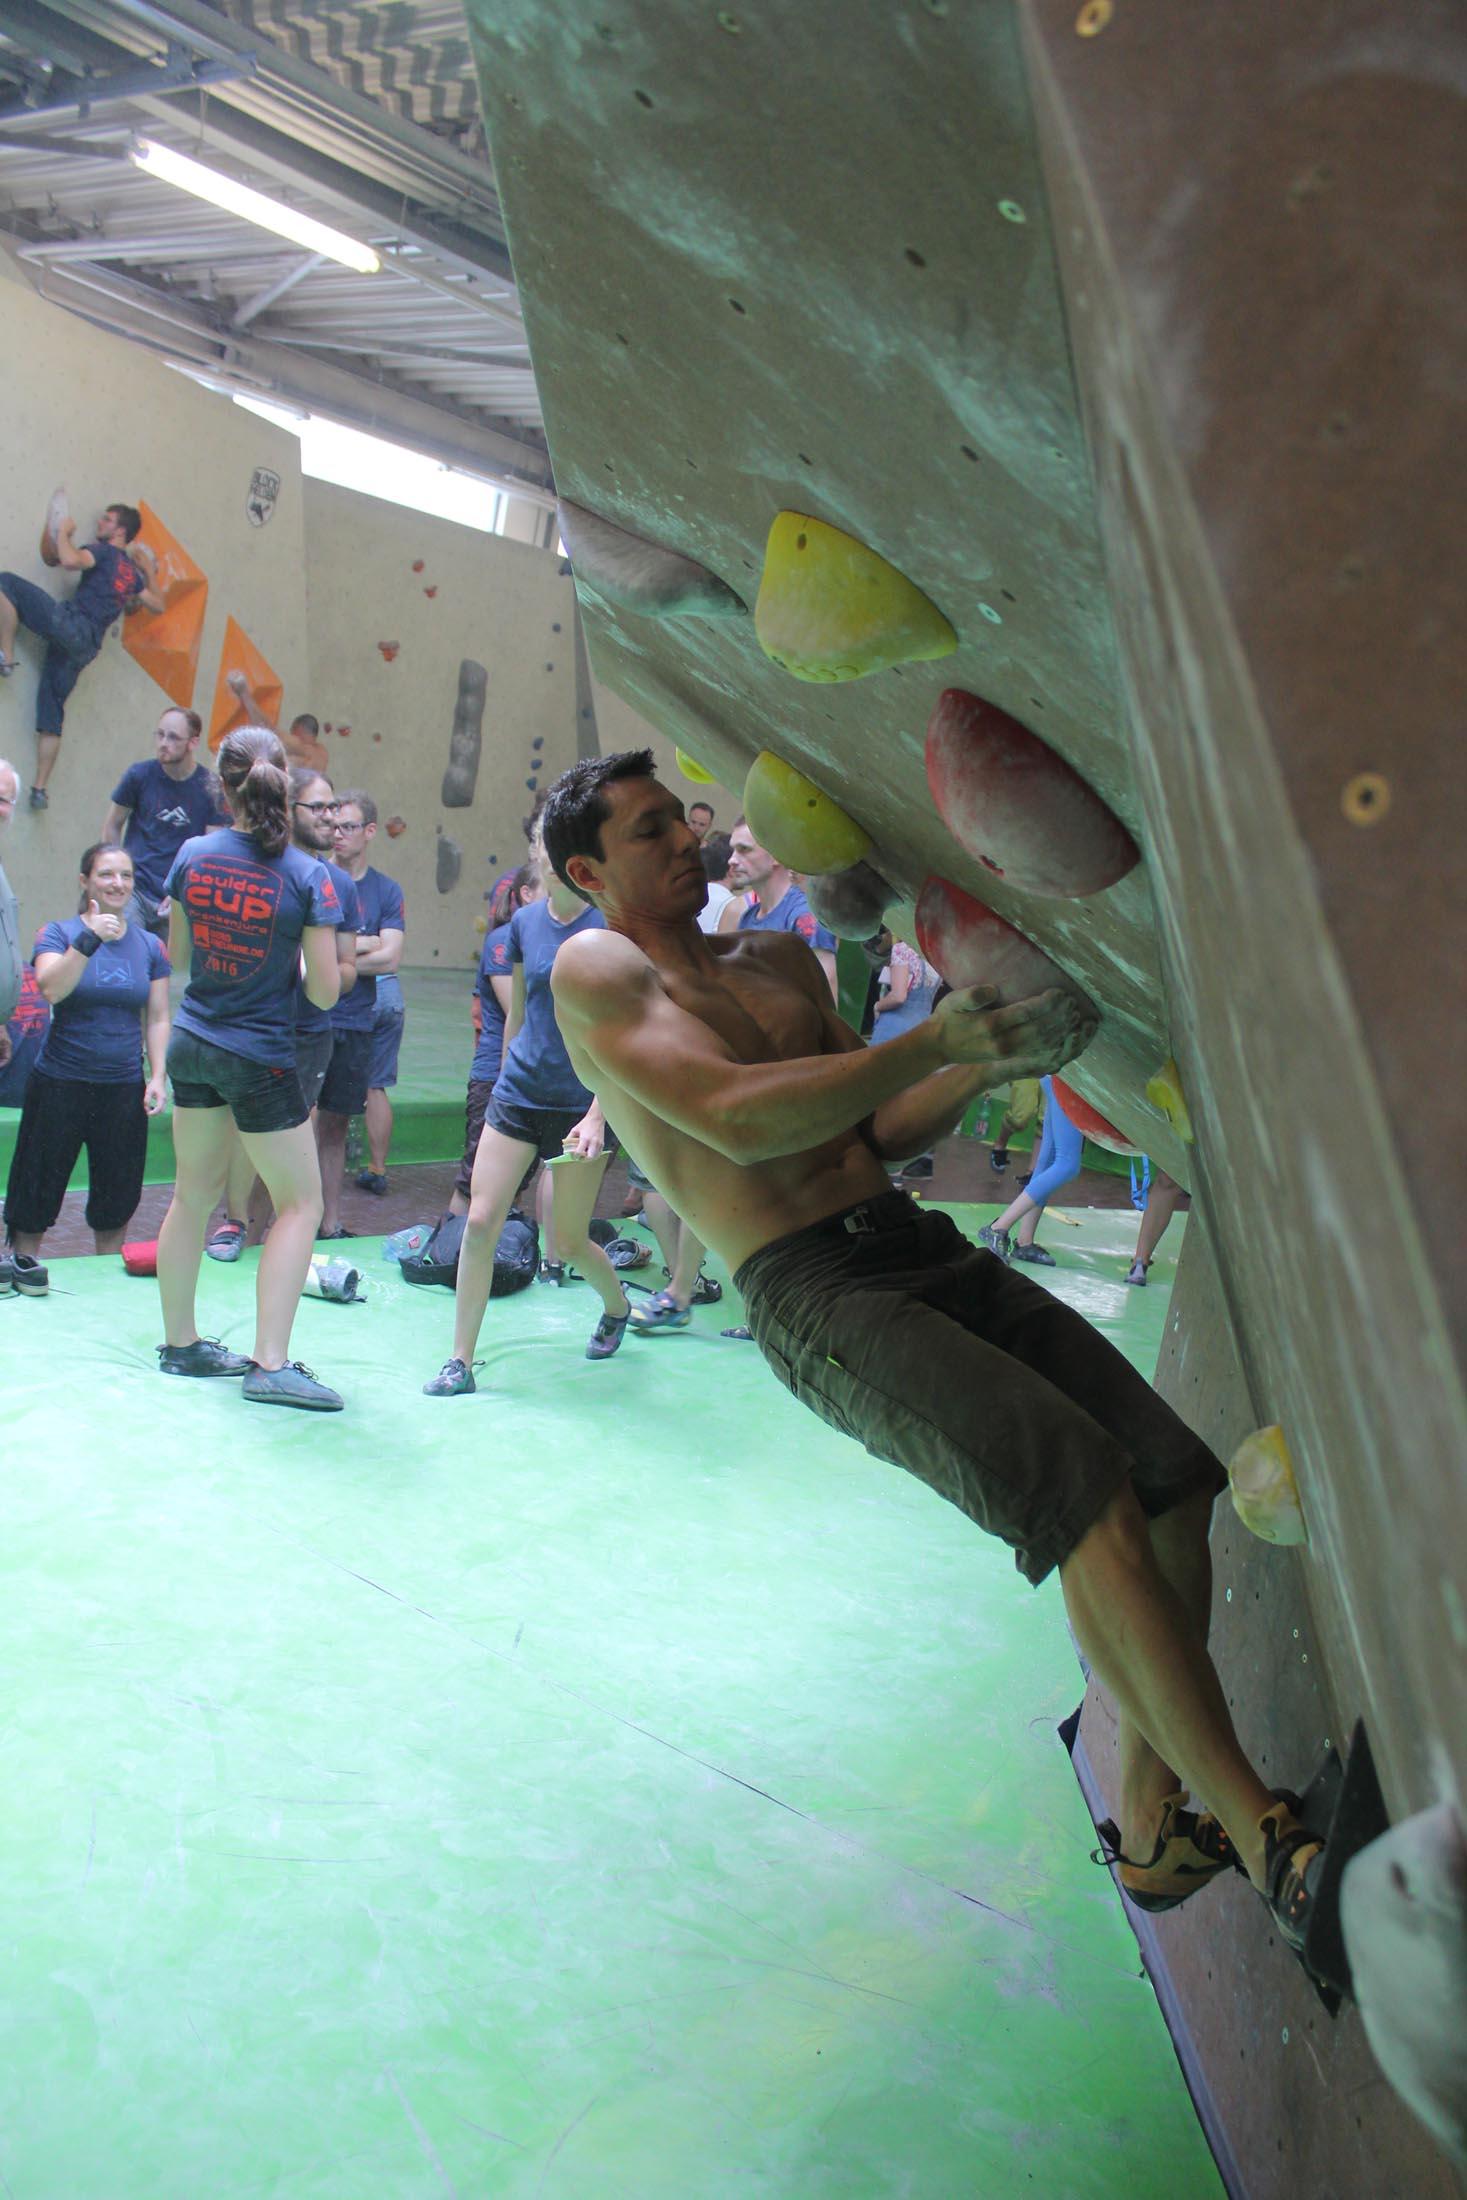 Quali, internationaler bouldercup Frankenjura 2016, BLOCKHELDEN Erlangen, Mammut, Bergfreunde.de, Boulderwettkampf07092016263